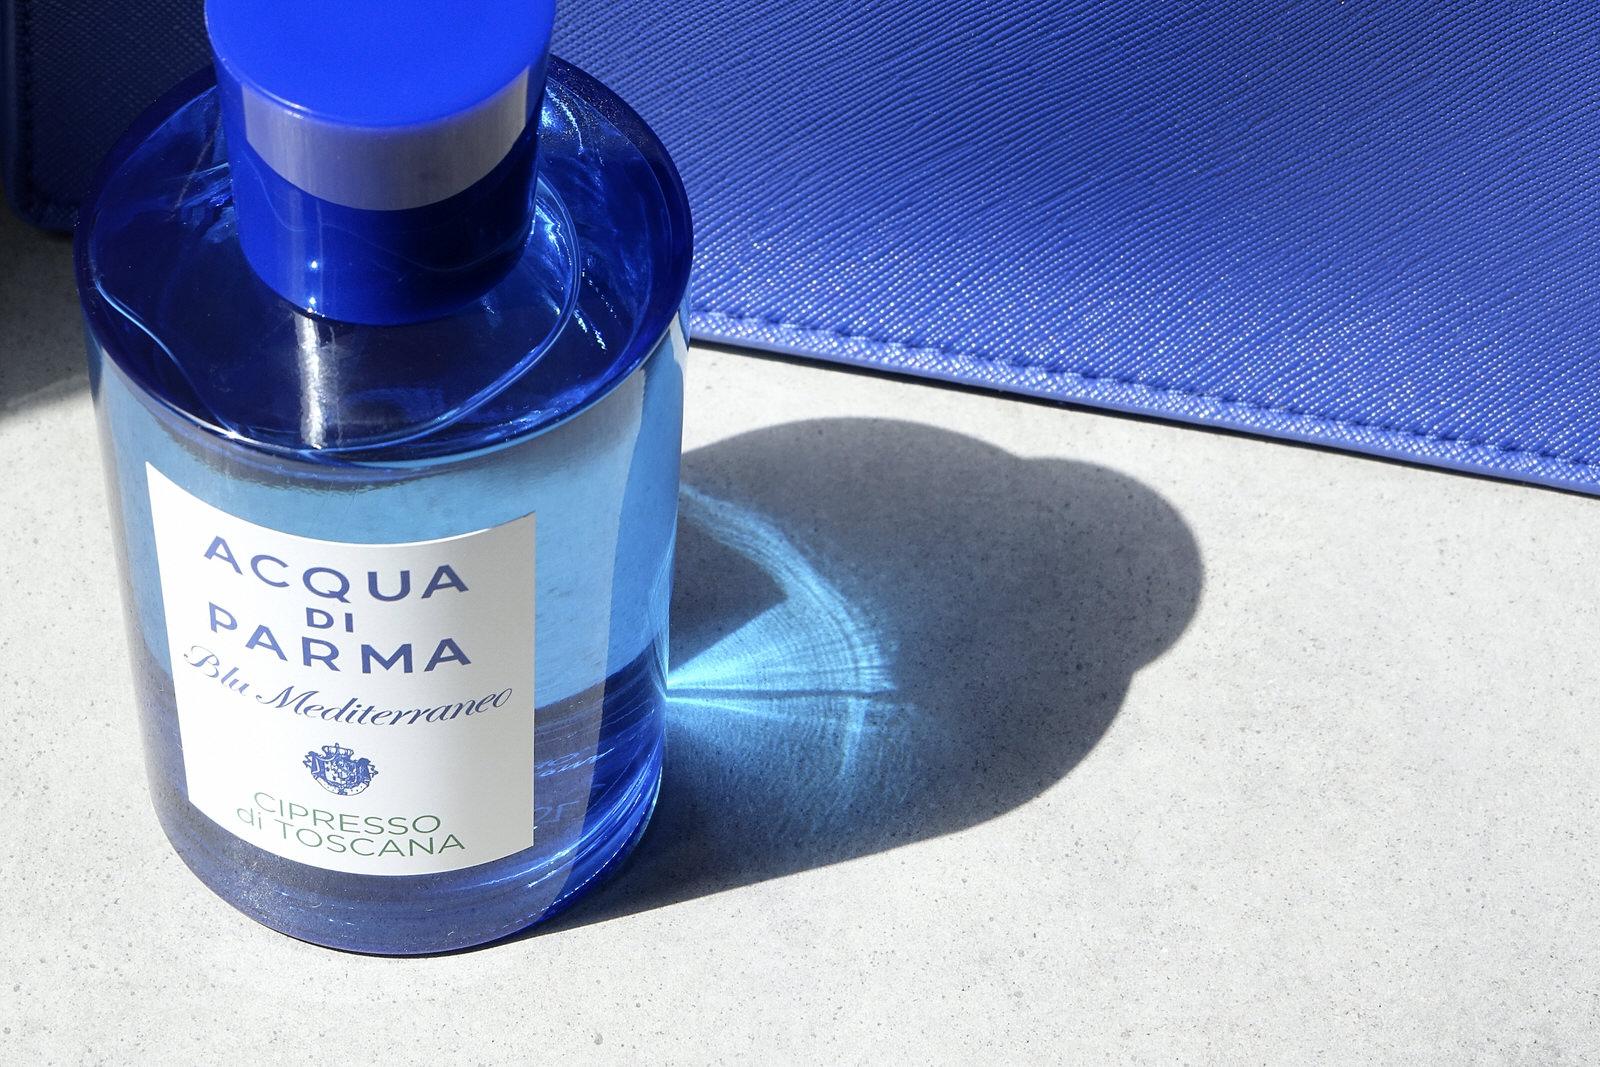 Le parfum Blu Mediterraneo d'Acqua di Parma